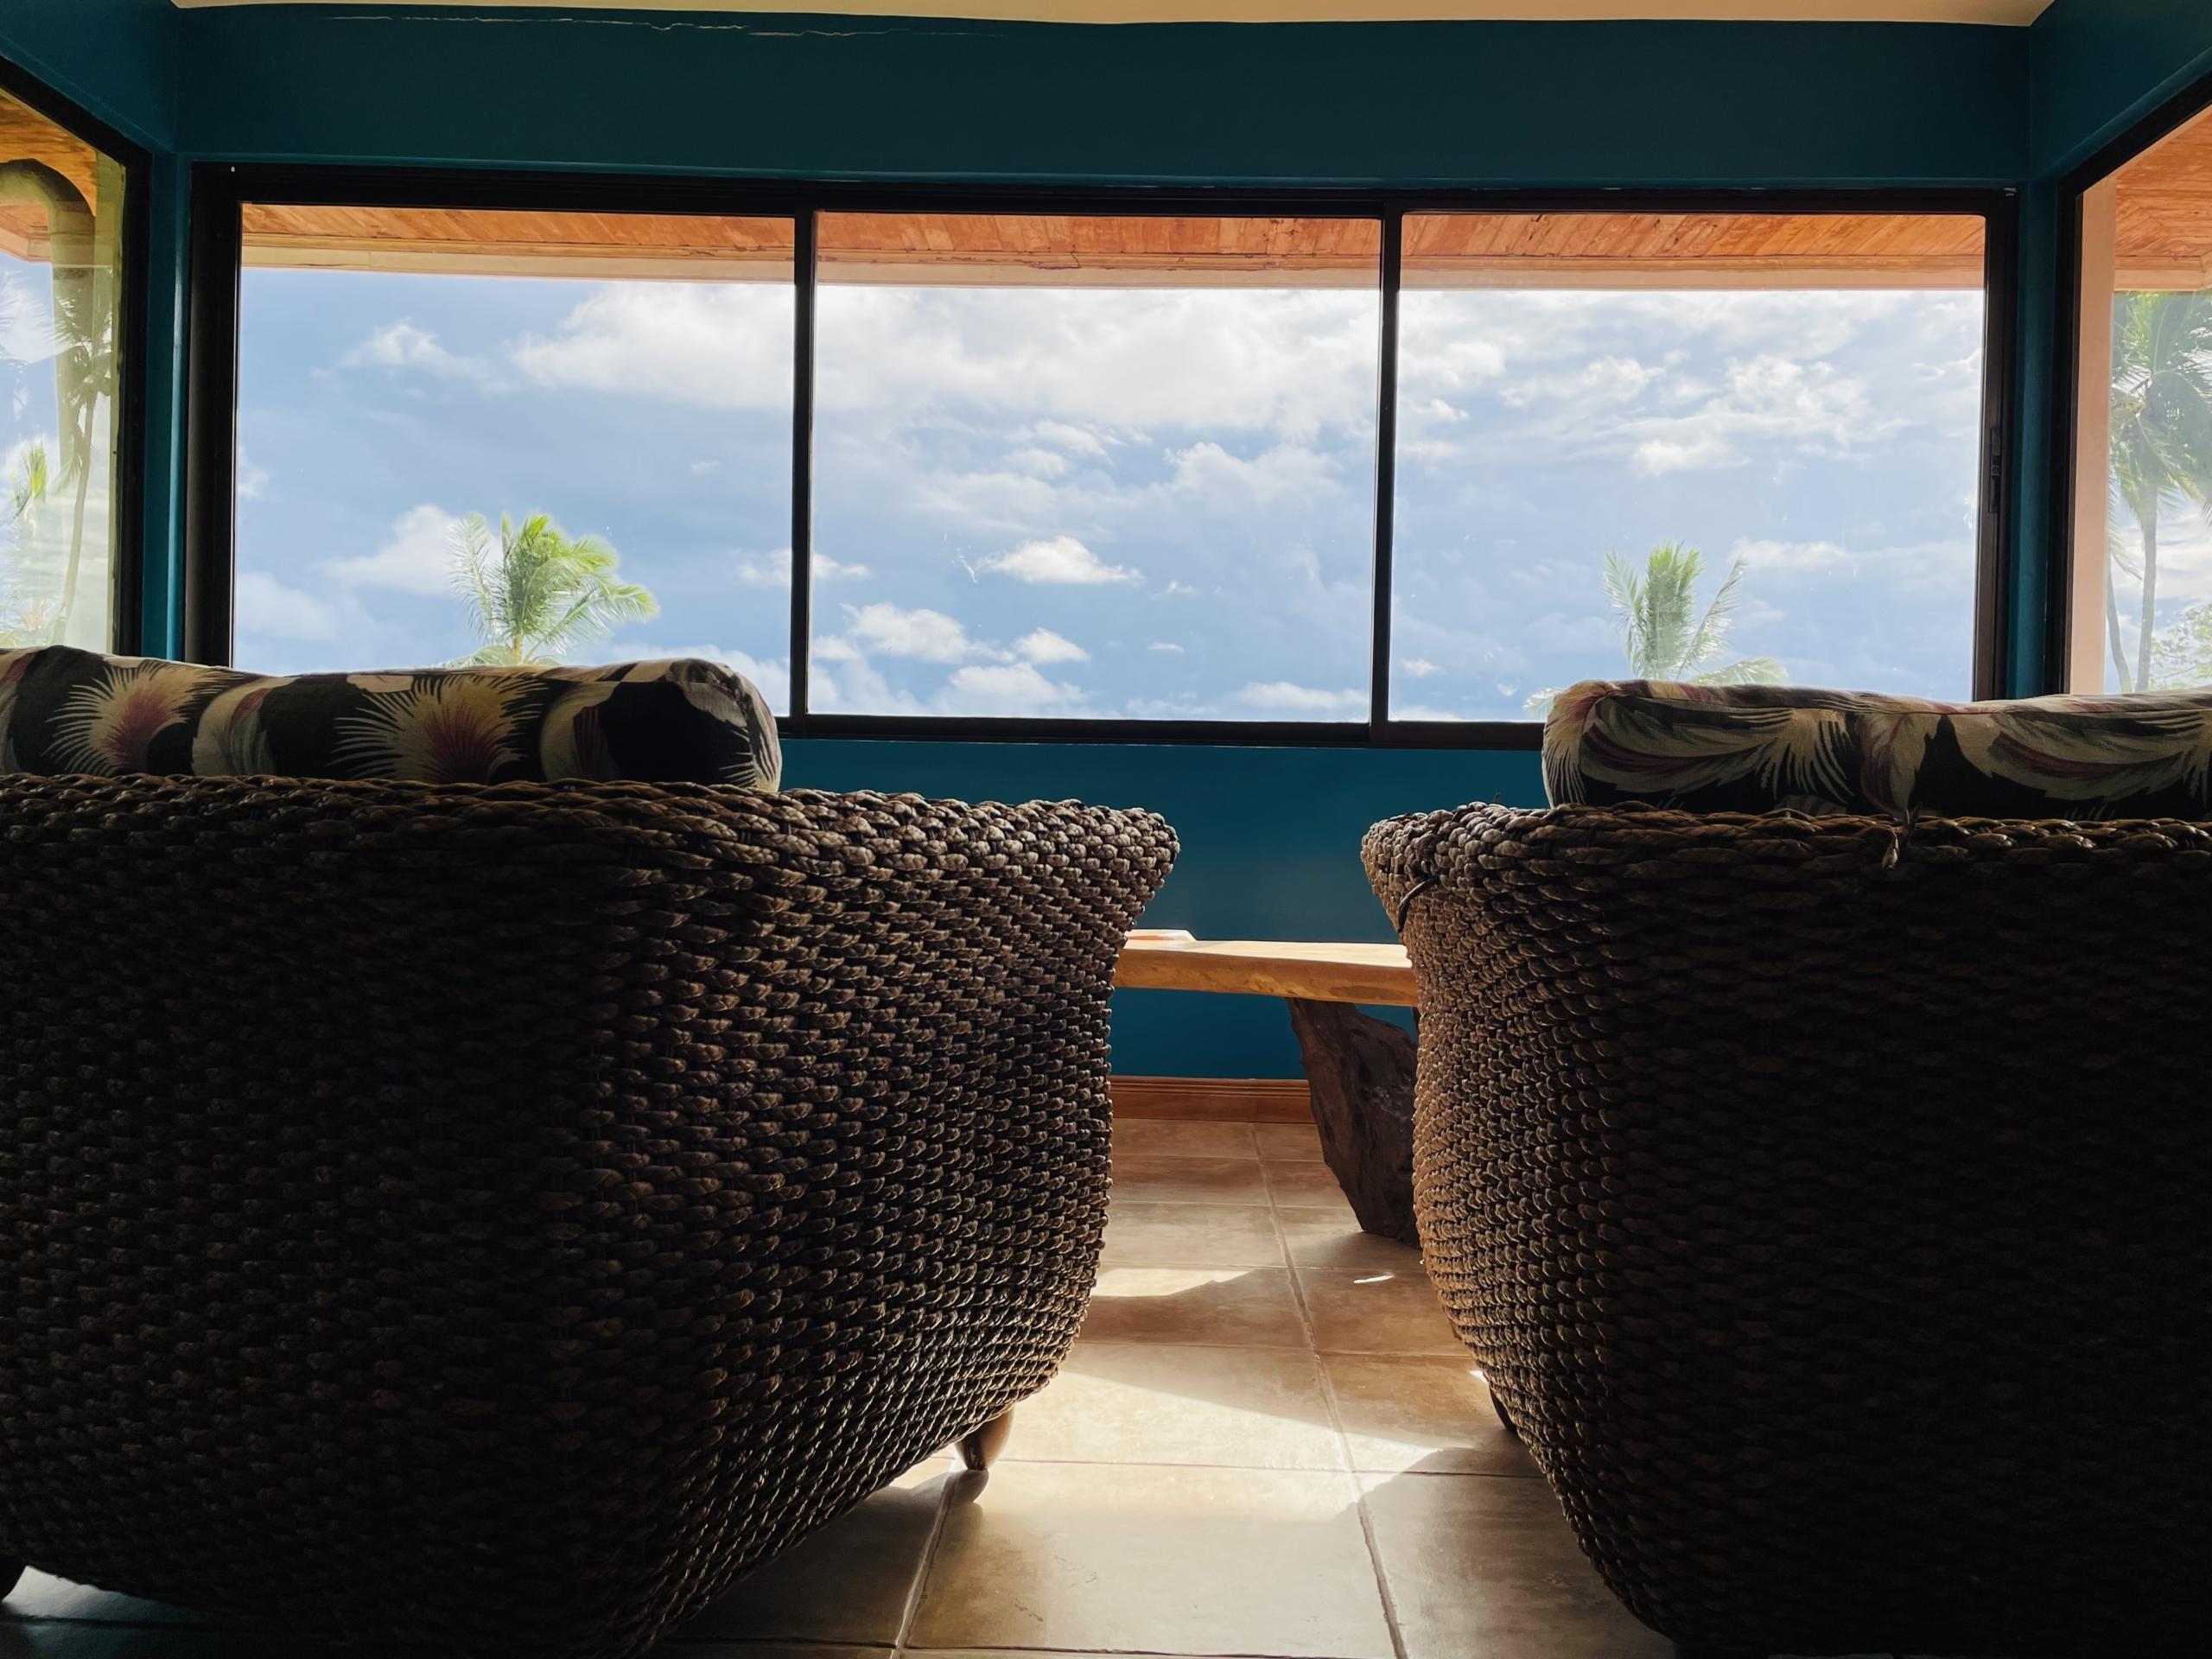 boca-barranca-viewing-room